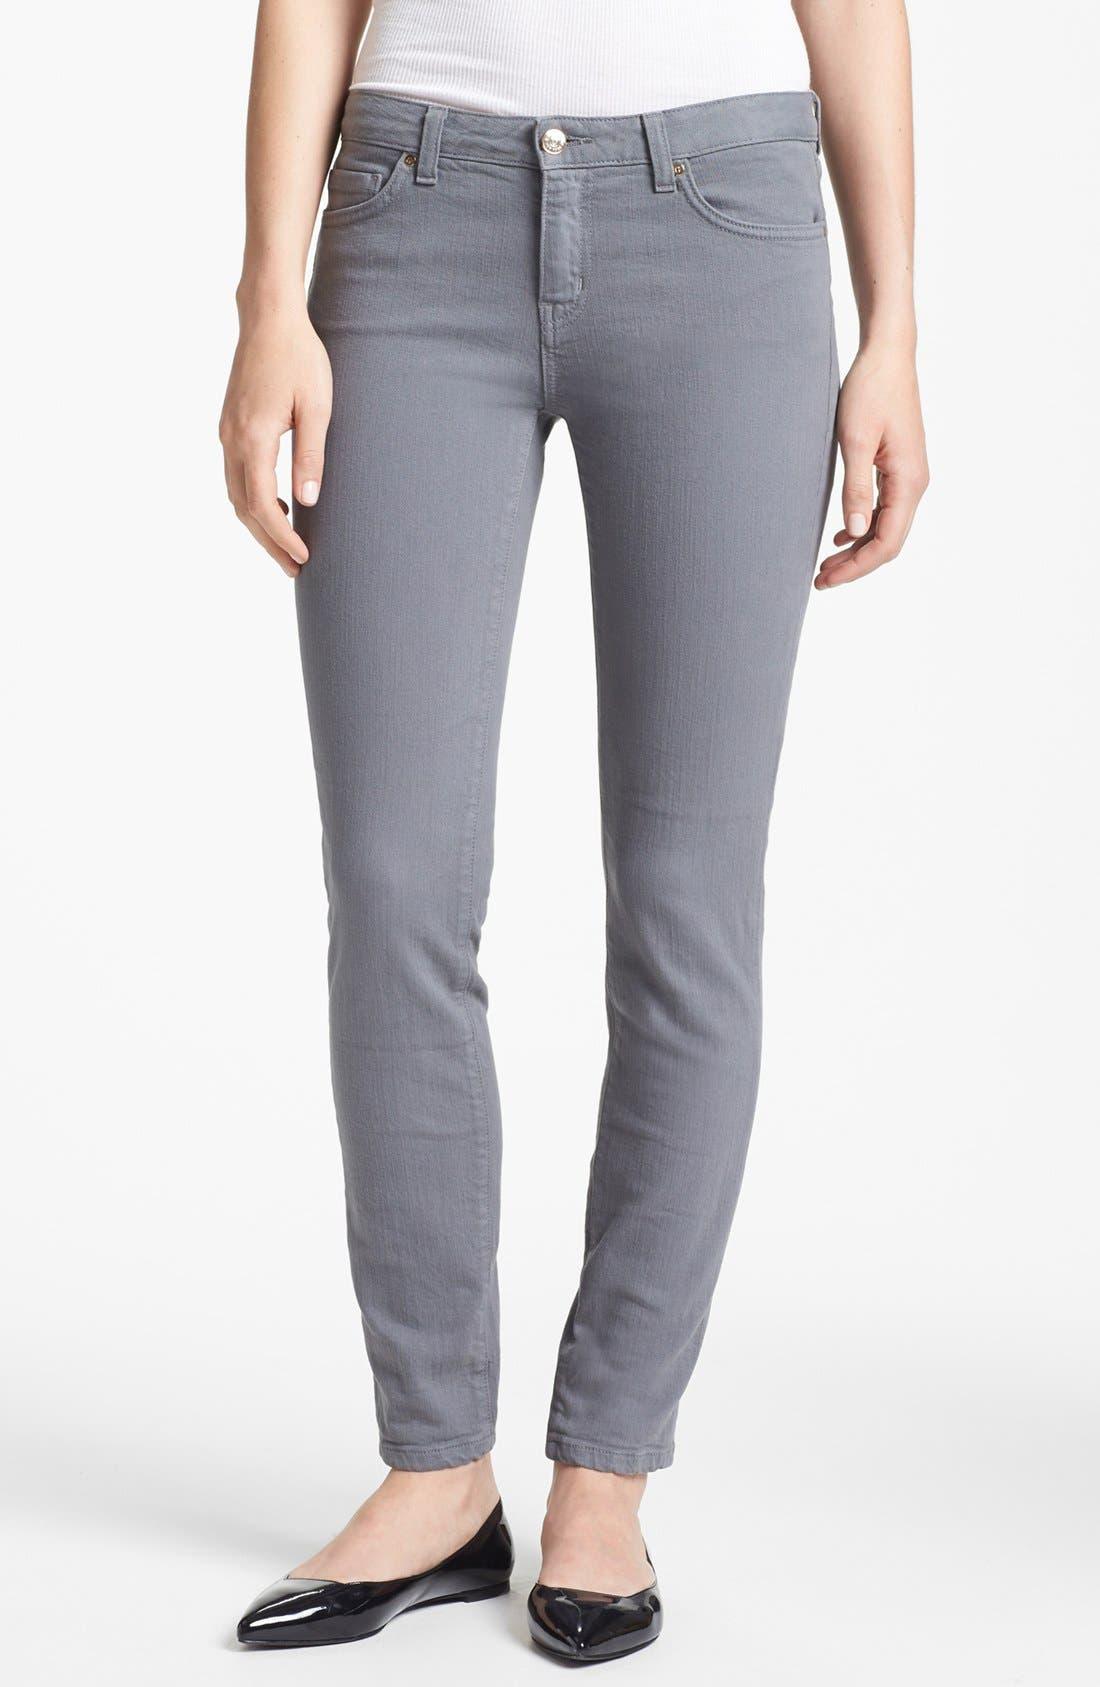 Alternate Image 1 Selected - kate spade new york 'broome street' overdyed skinny jeans (Medium Grey)